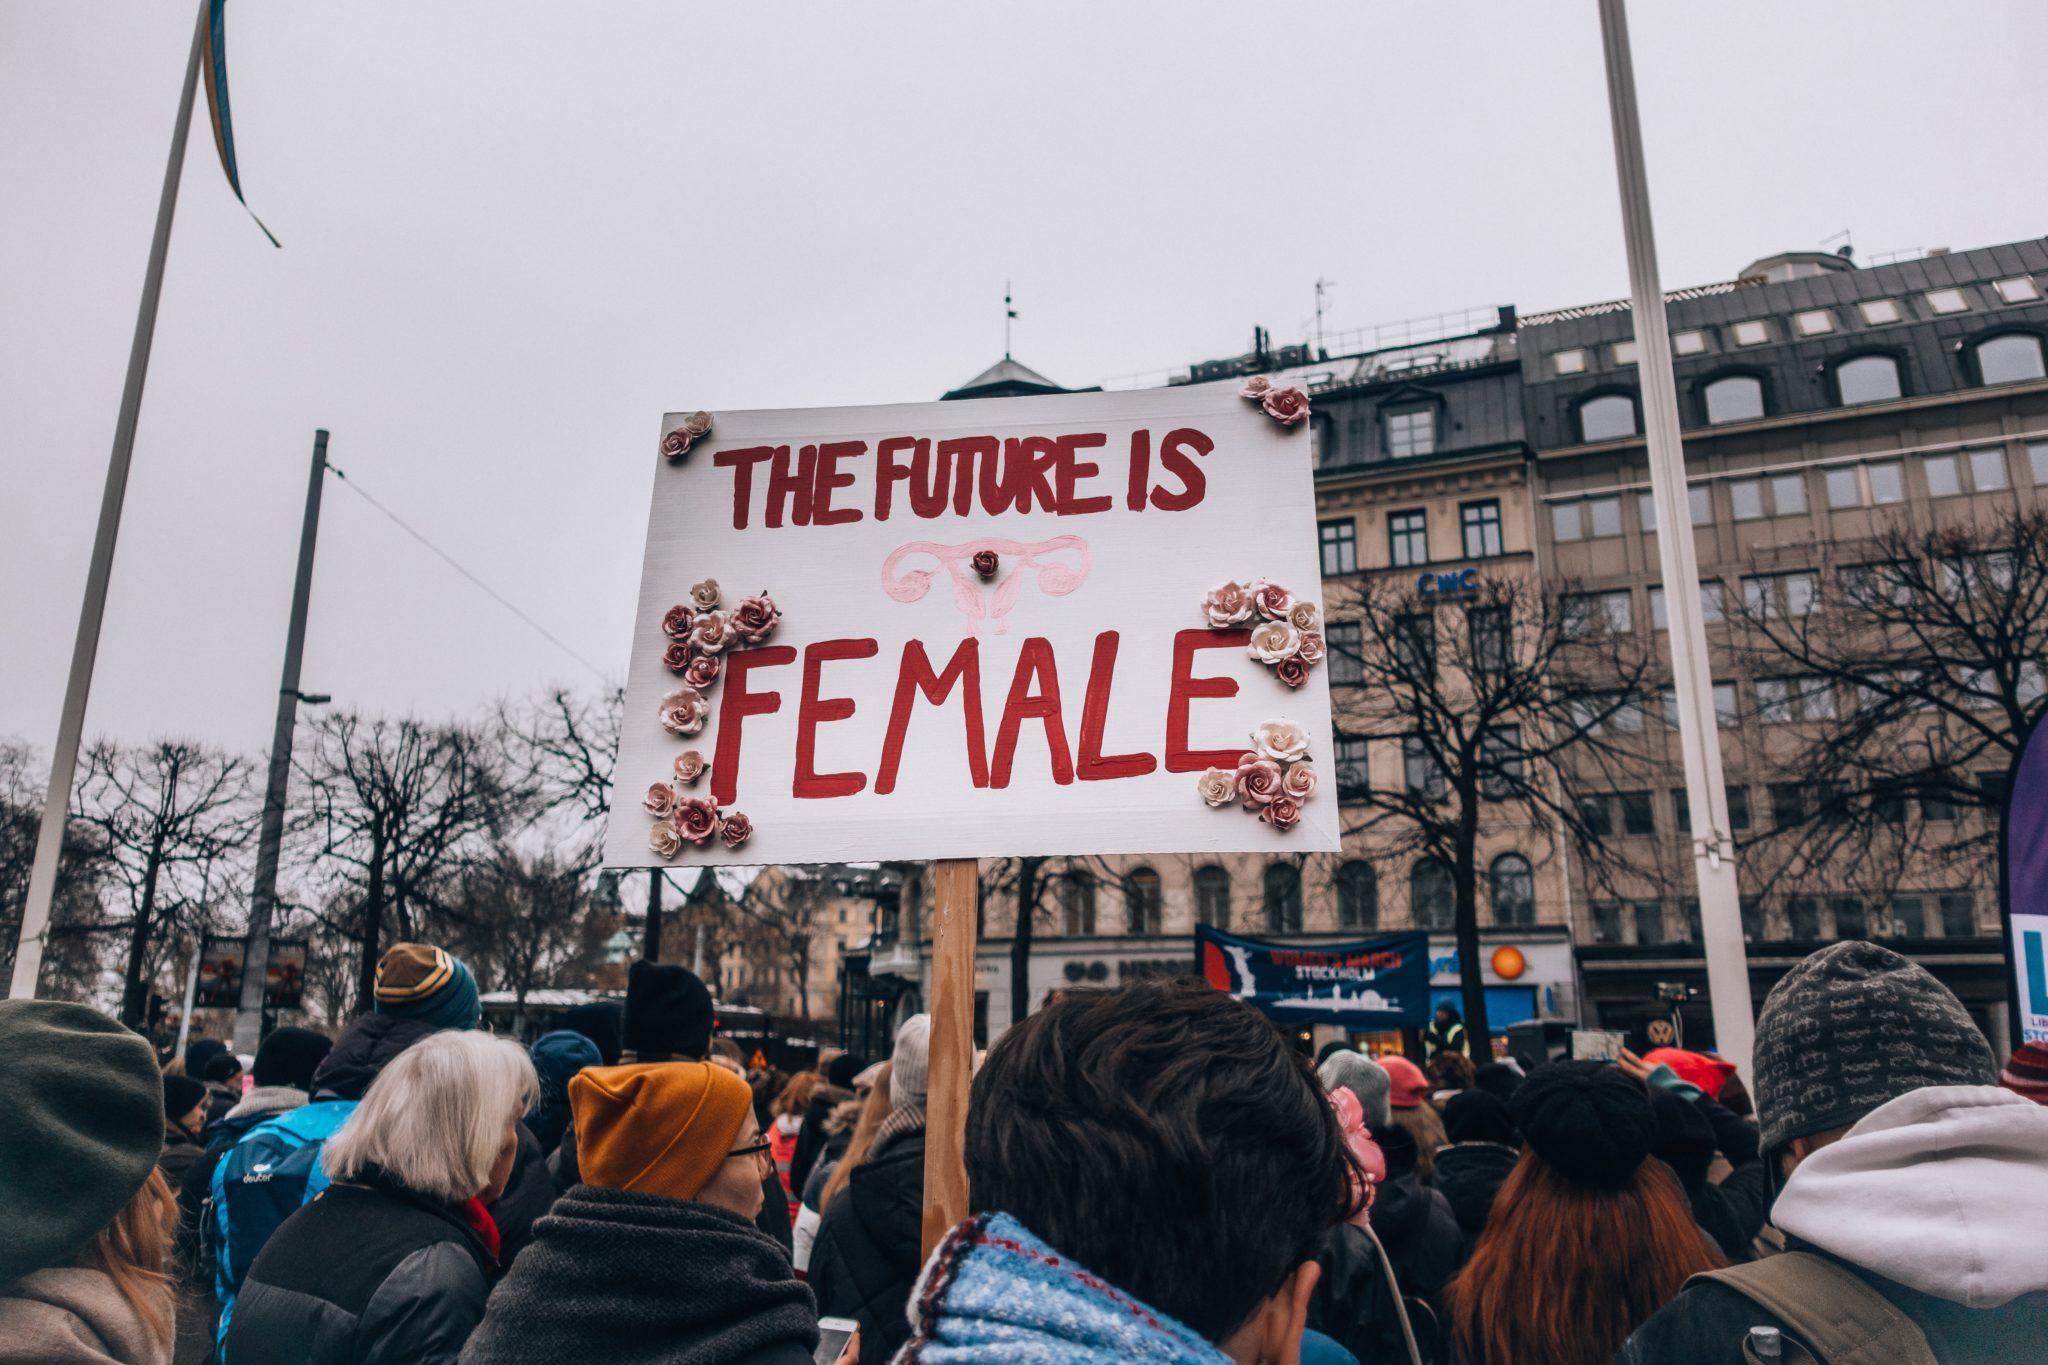 Can modern feminism start the descrimination of men?